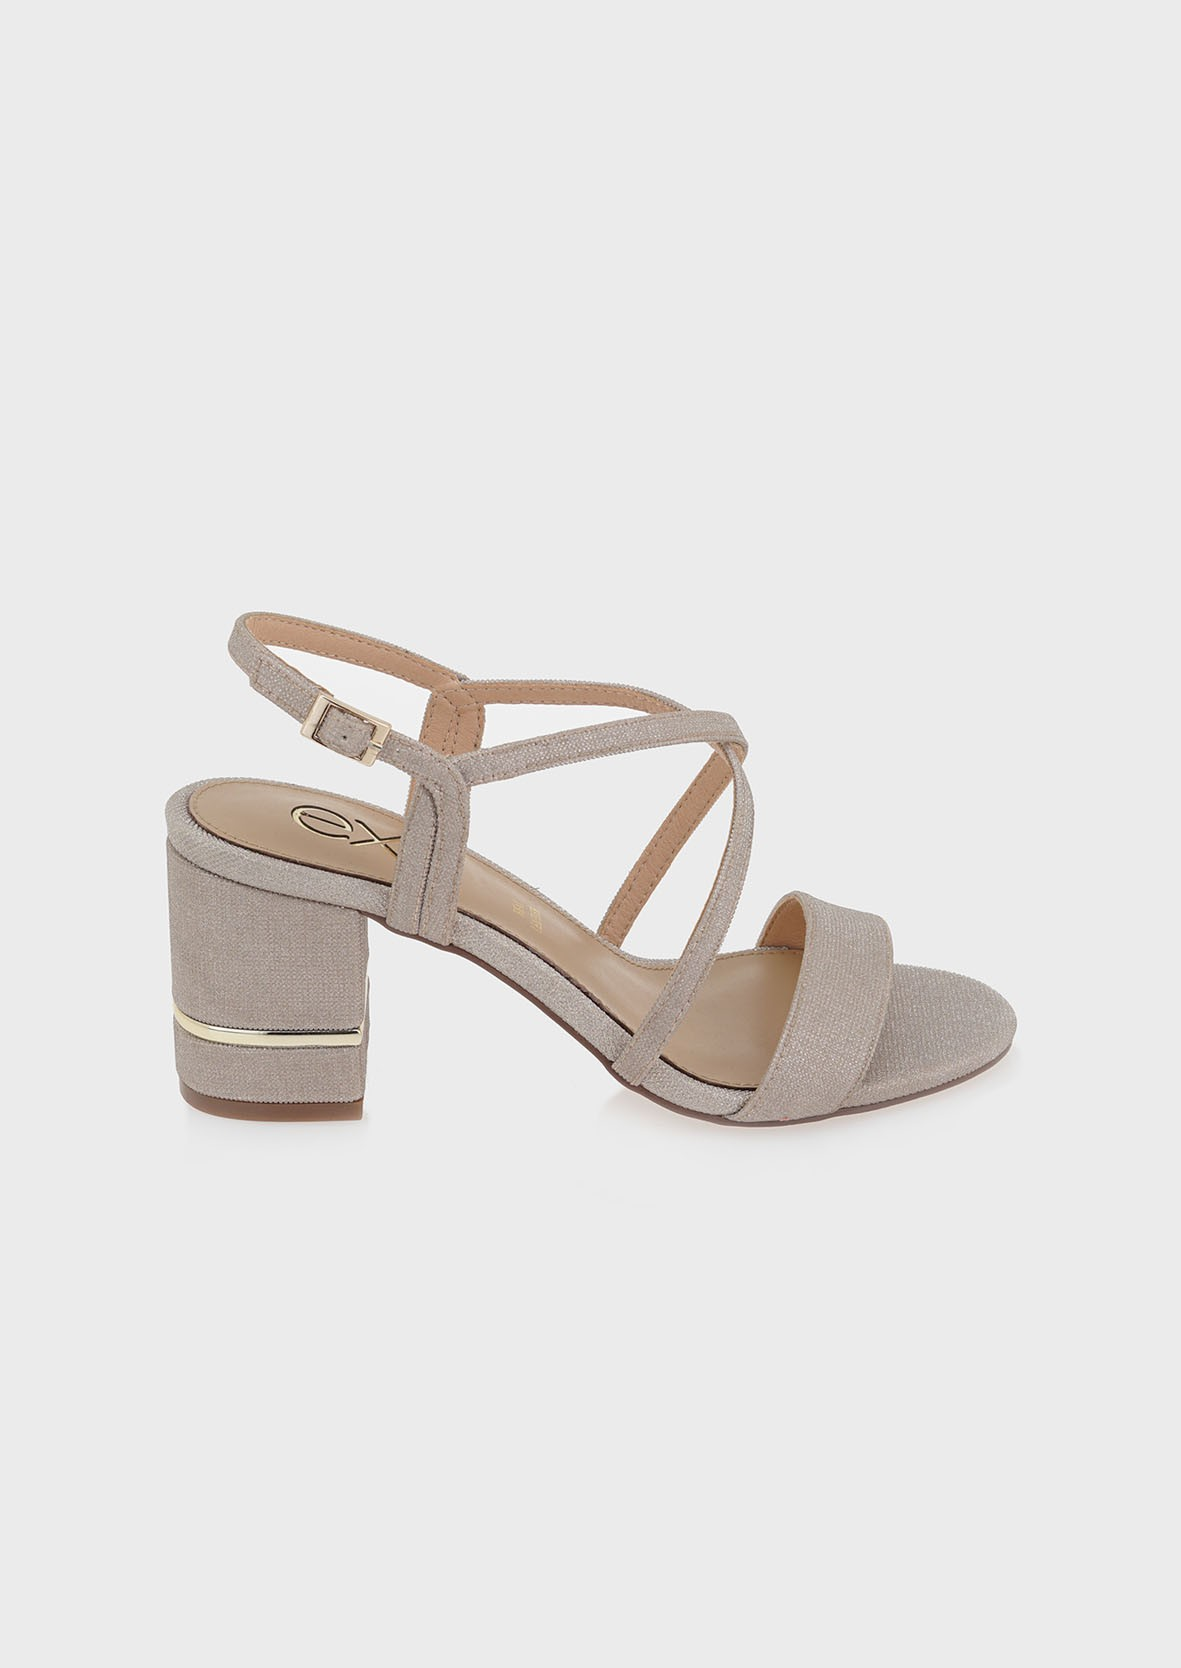 EXE Shoes Πέδιλα Γυναικεία 026-PENNY-266 Πλατίνα GLITTER M4700026479C